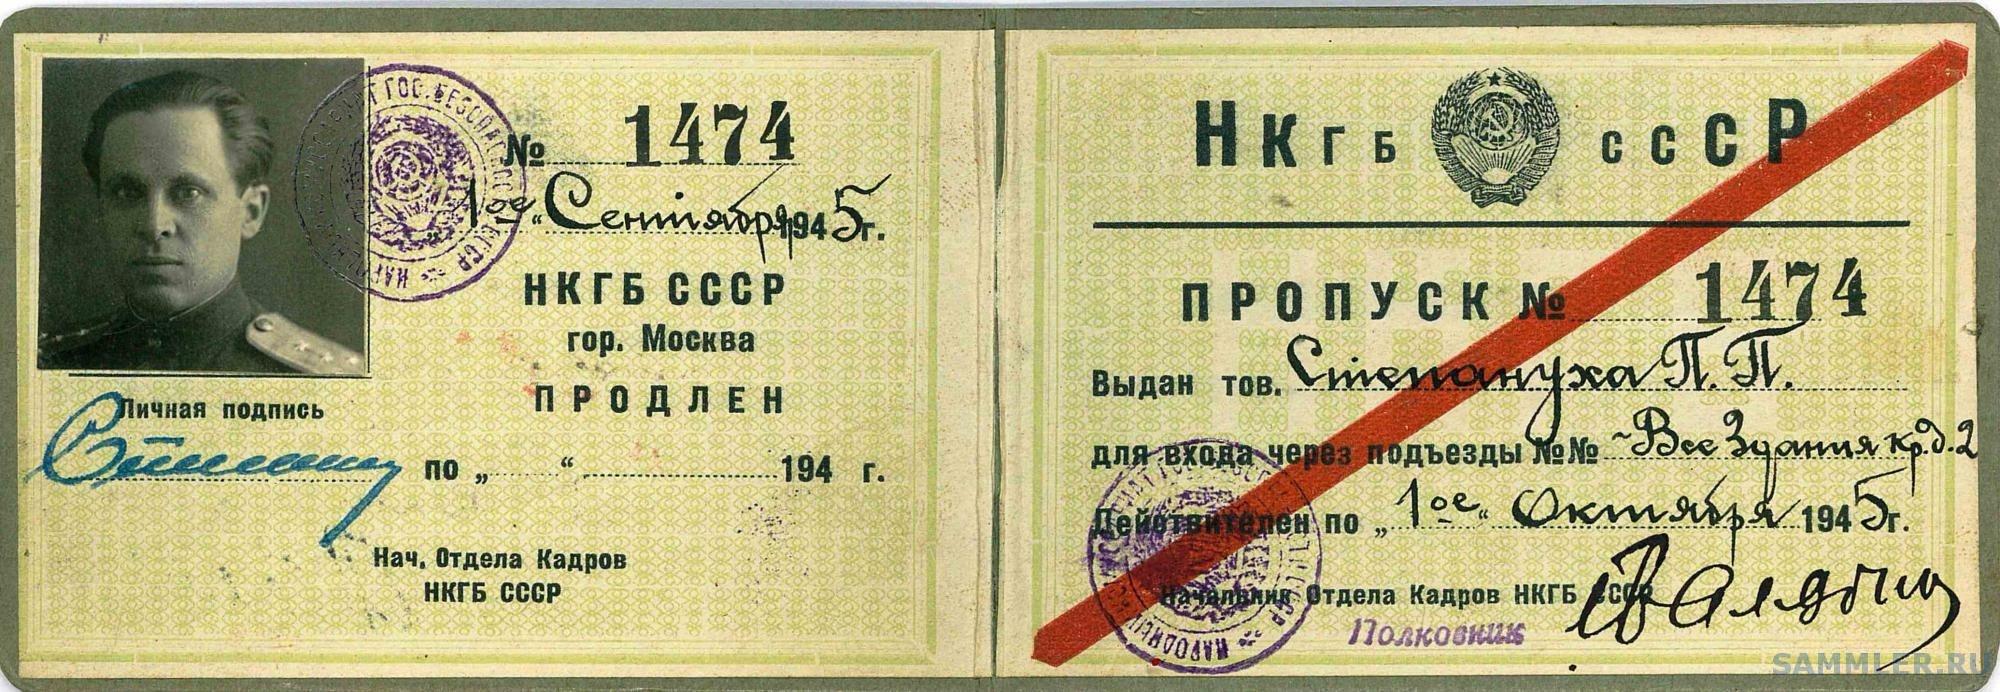 Пропуск НКГБ СССР 1474 Степануха Прокофий Петрович-2.jpg